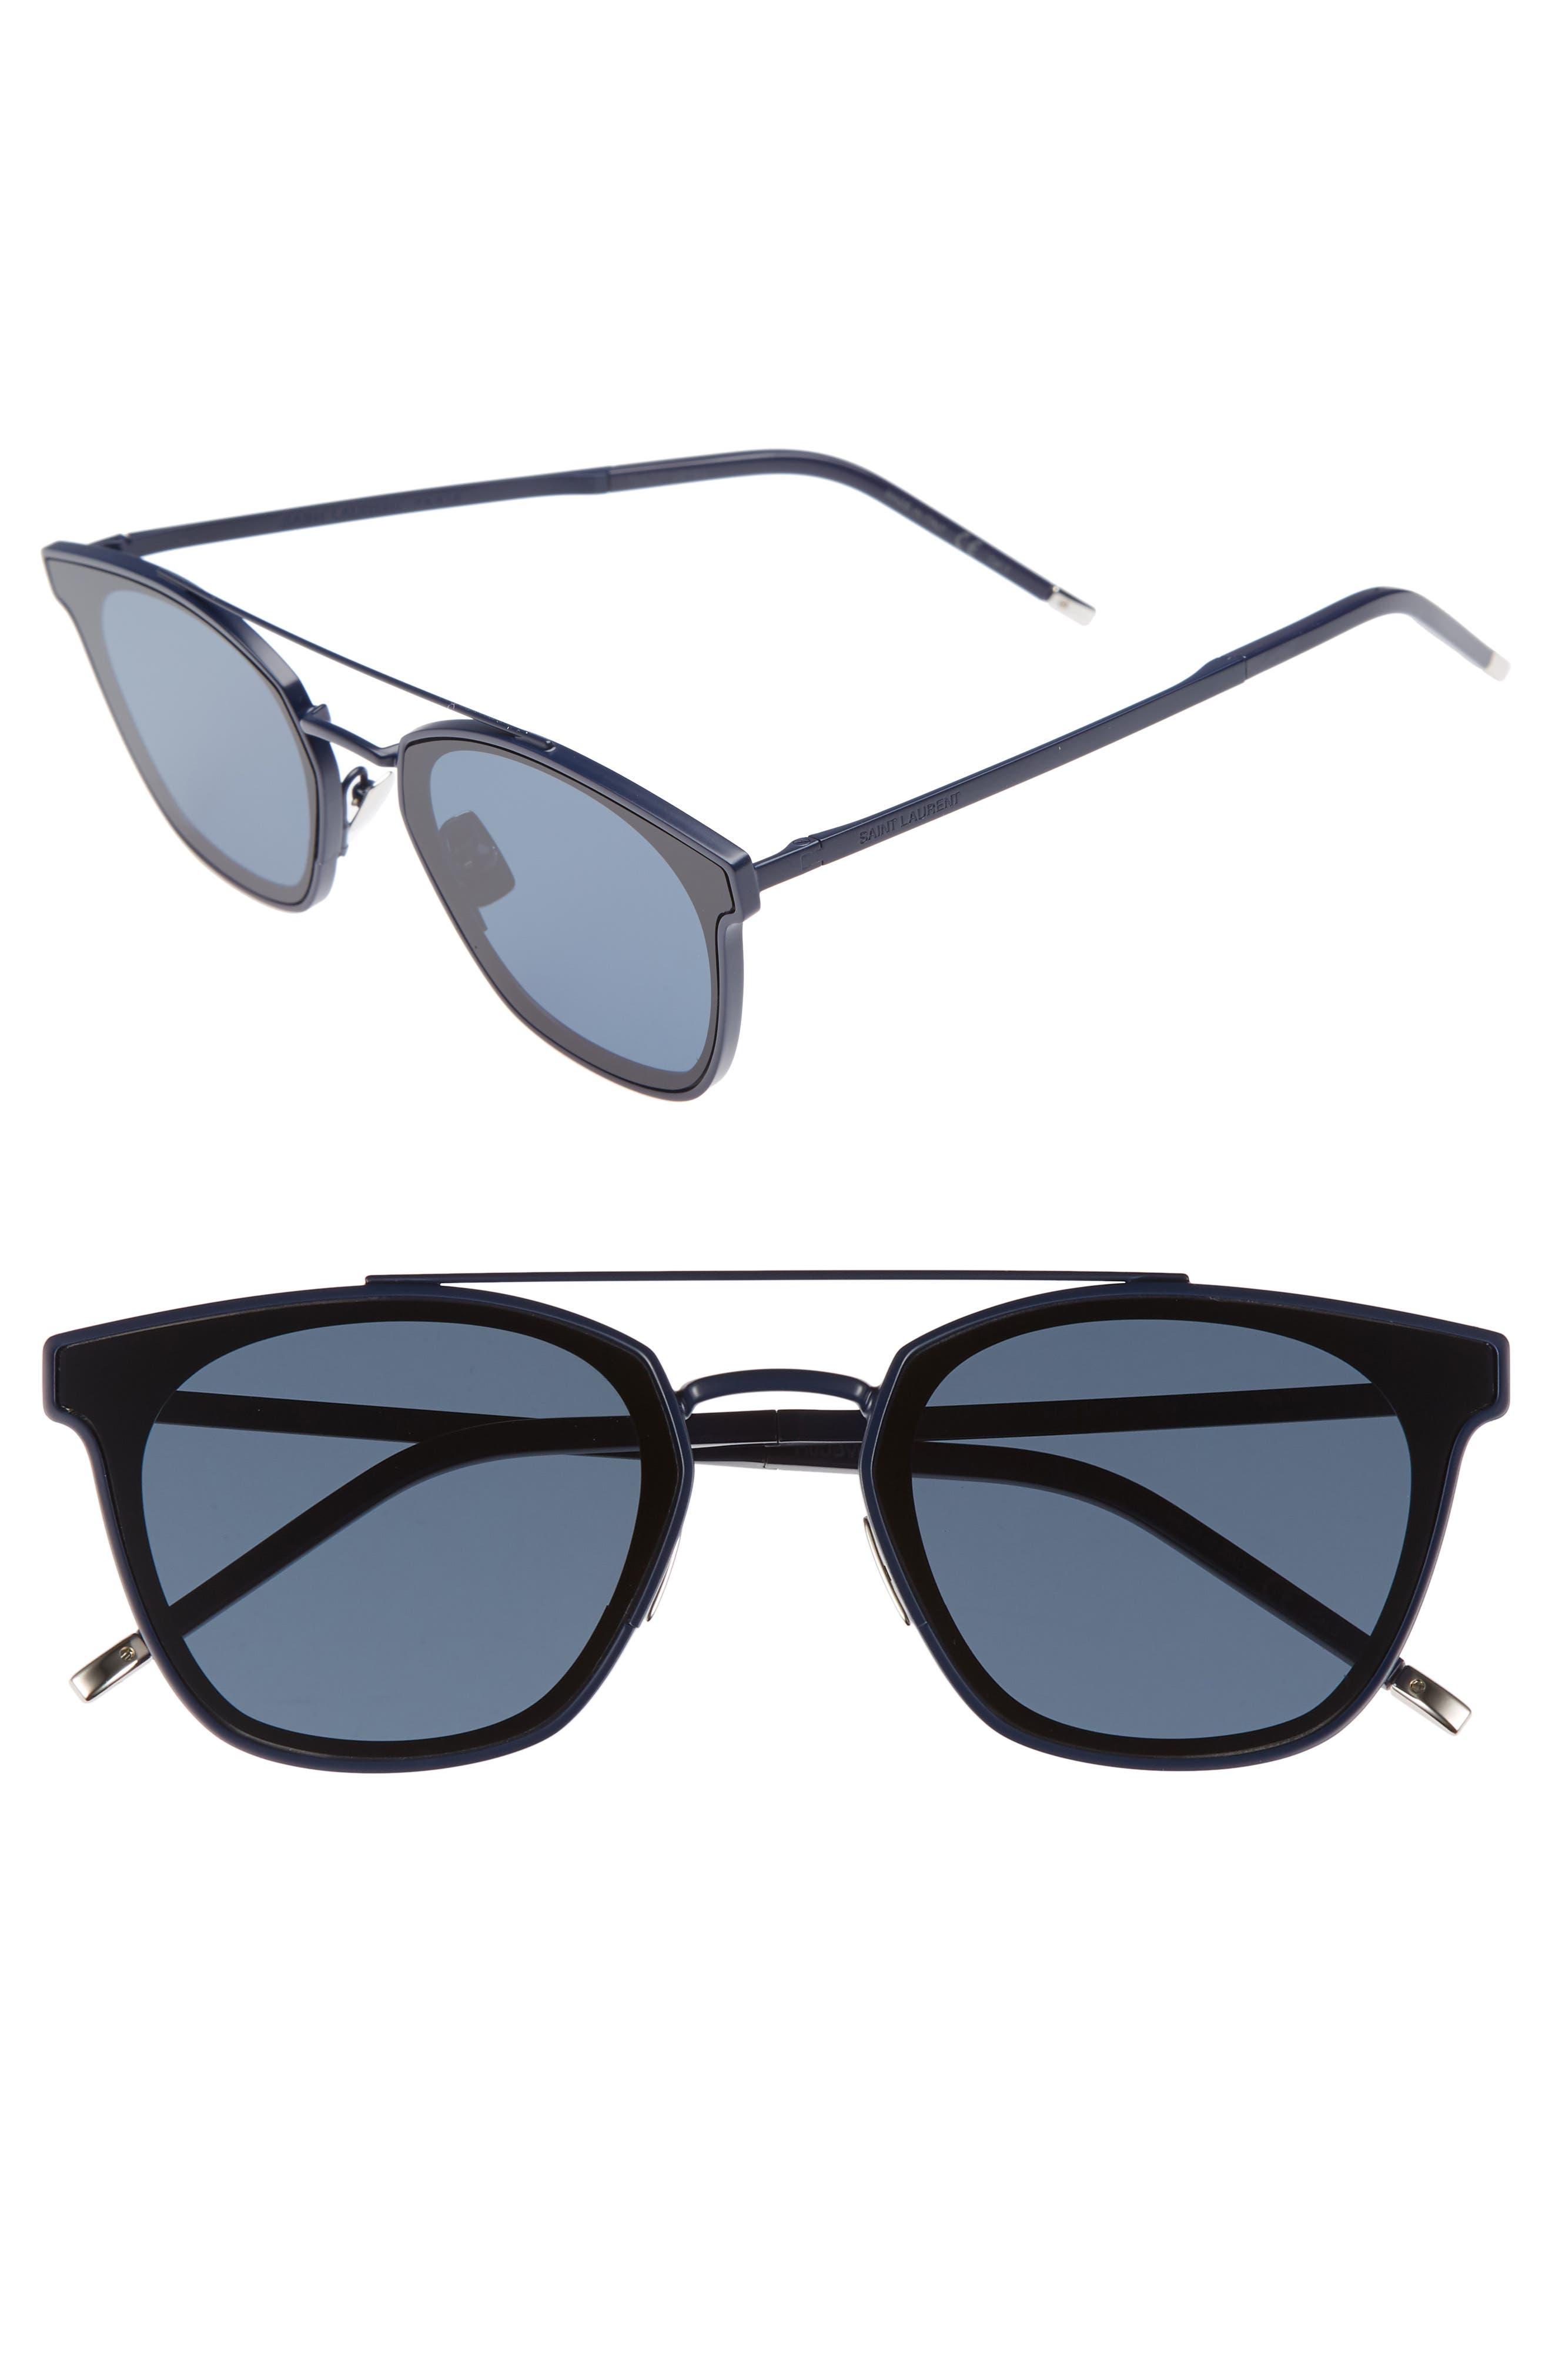 Saint Laurent SL 28 61mm Polarized Sunglasses